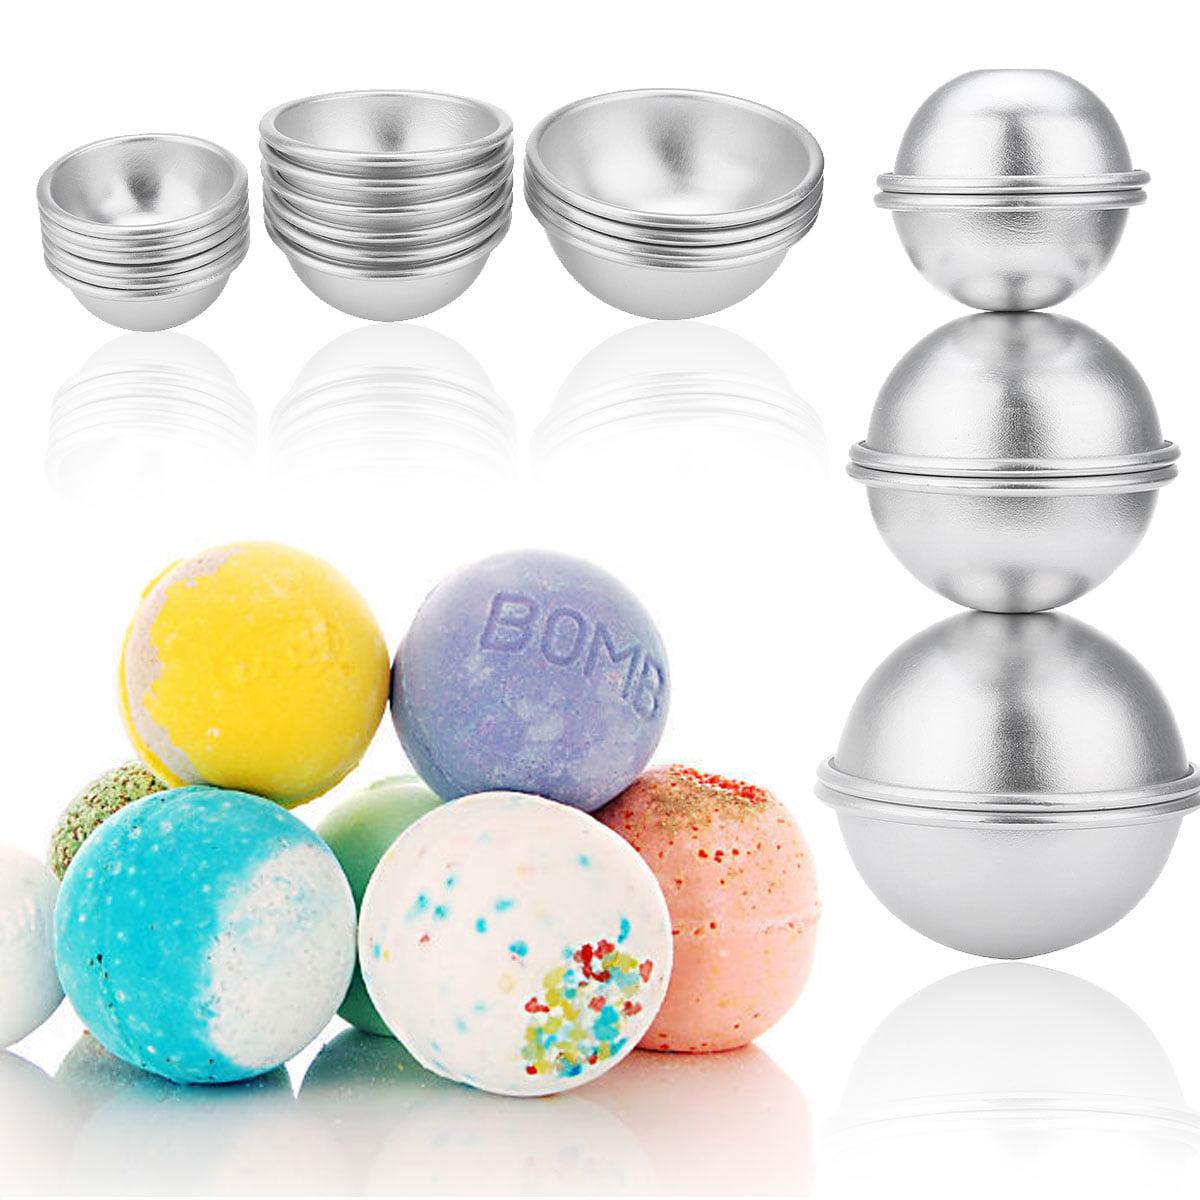 16pcs Set Bath Bomb Mold Set Kit 8 Pairs 3 size Aluminium Alloy Bath Bomb Ball Mold For DIY Homemade Crafting by